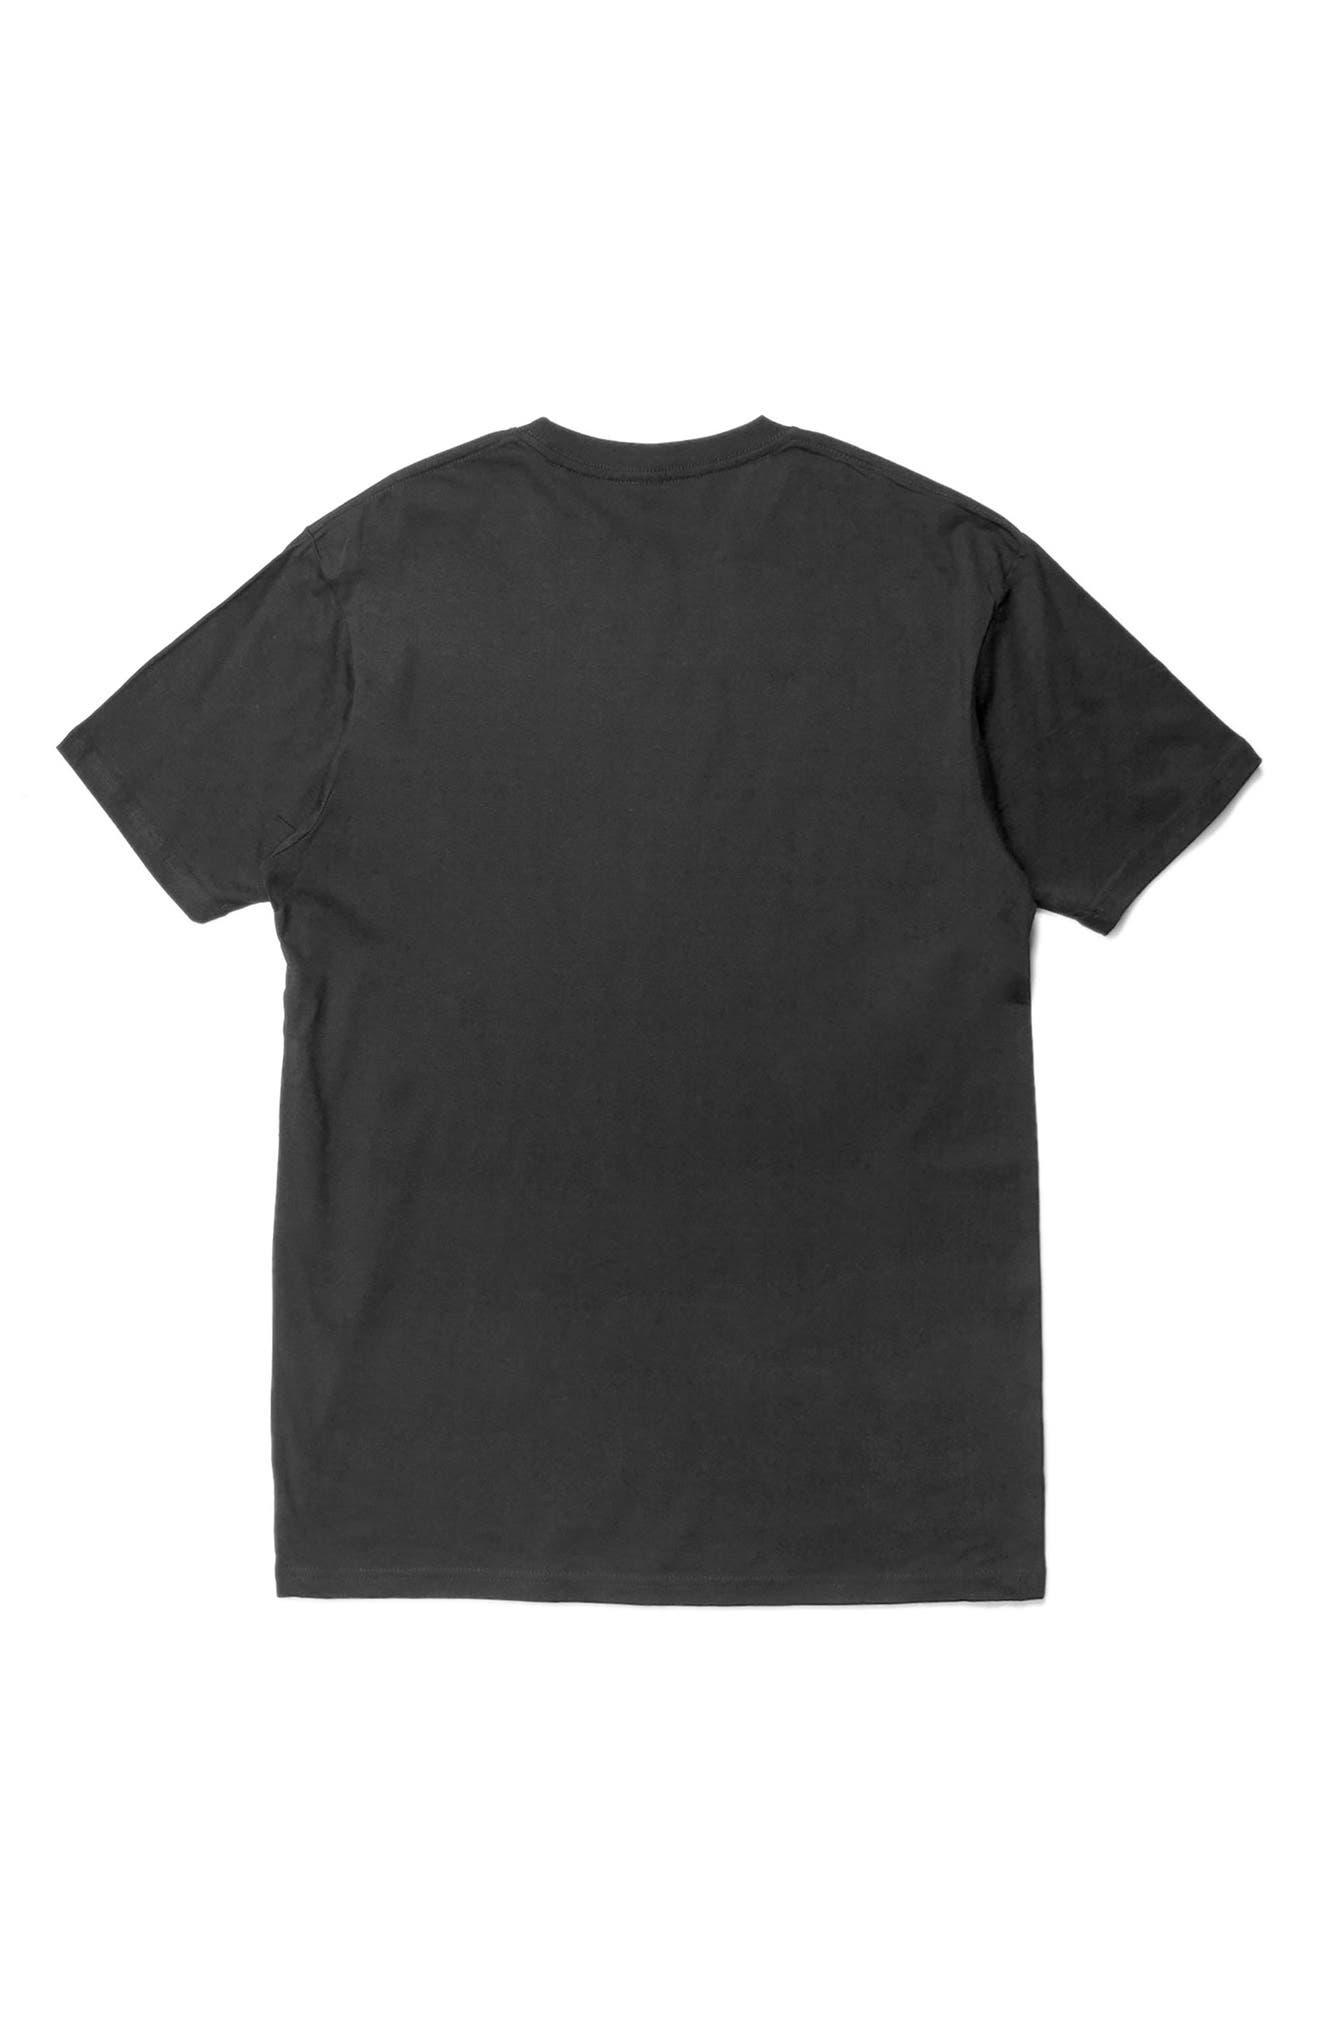 Positive Future Graphic T-Shirt,                             Alternate thumbnail 2, color,                             Black